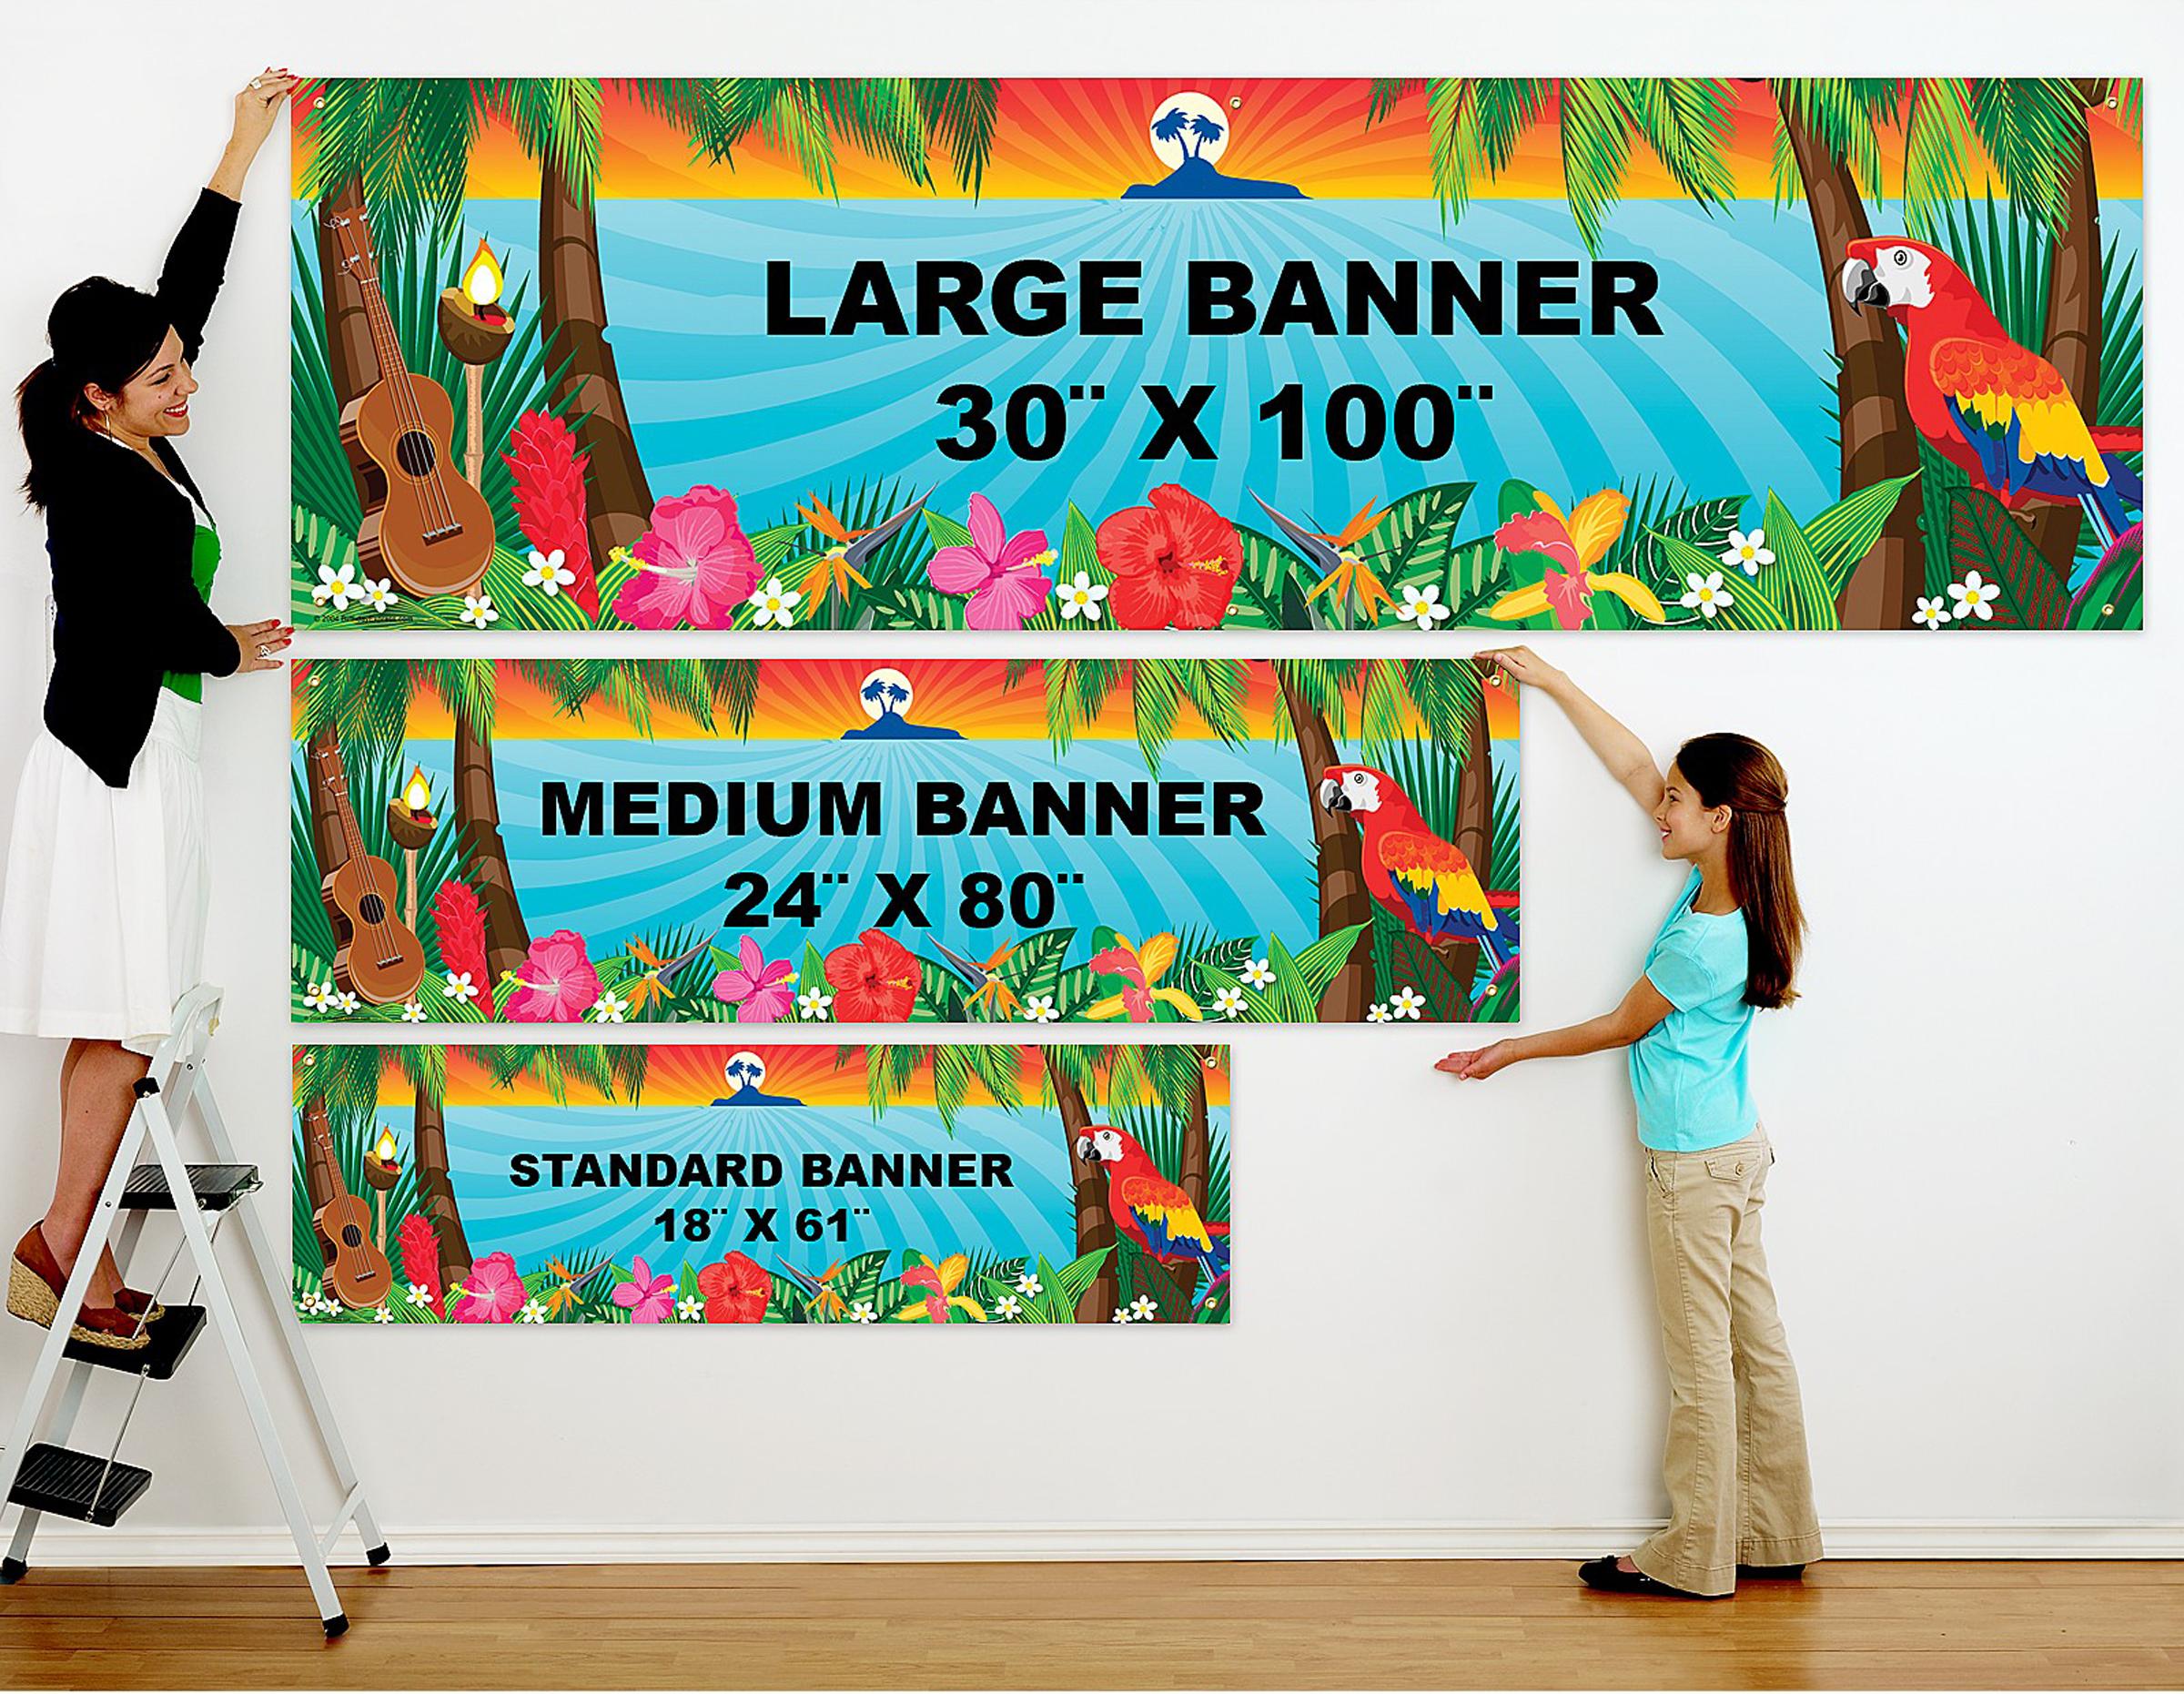 Best Vinyl Banner Printing Ideas On Pinterest Vistaprint - Vinyl banners with pole pocketssignbanner printing